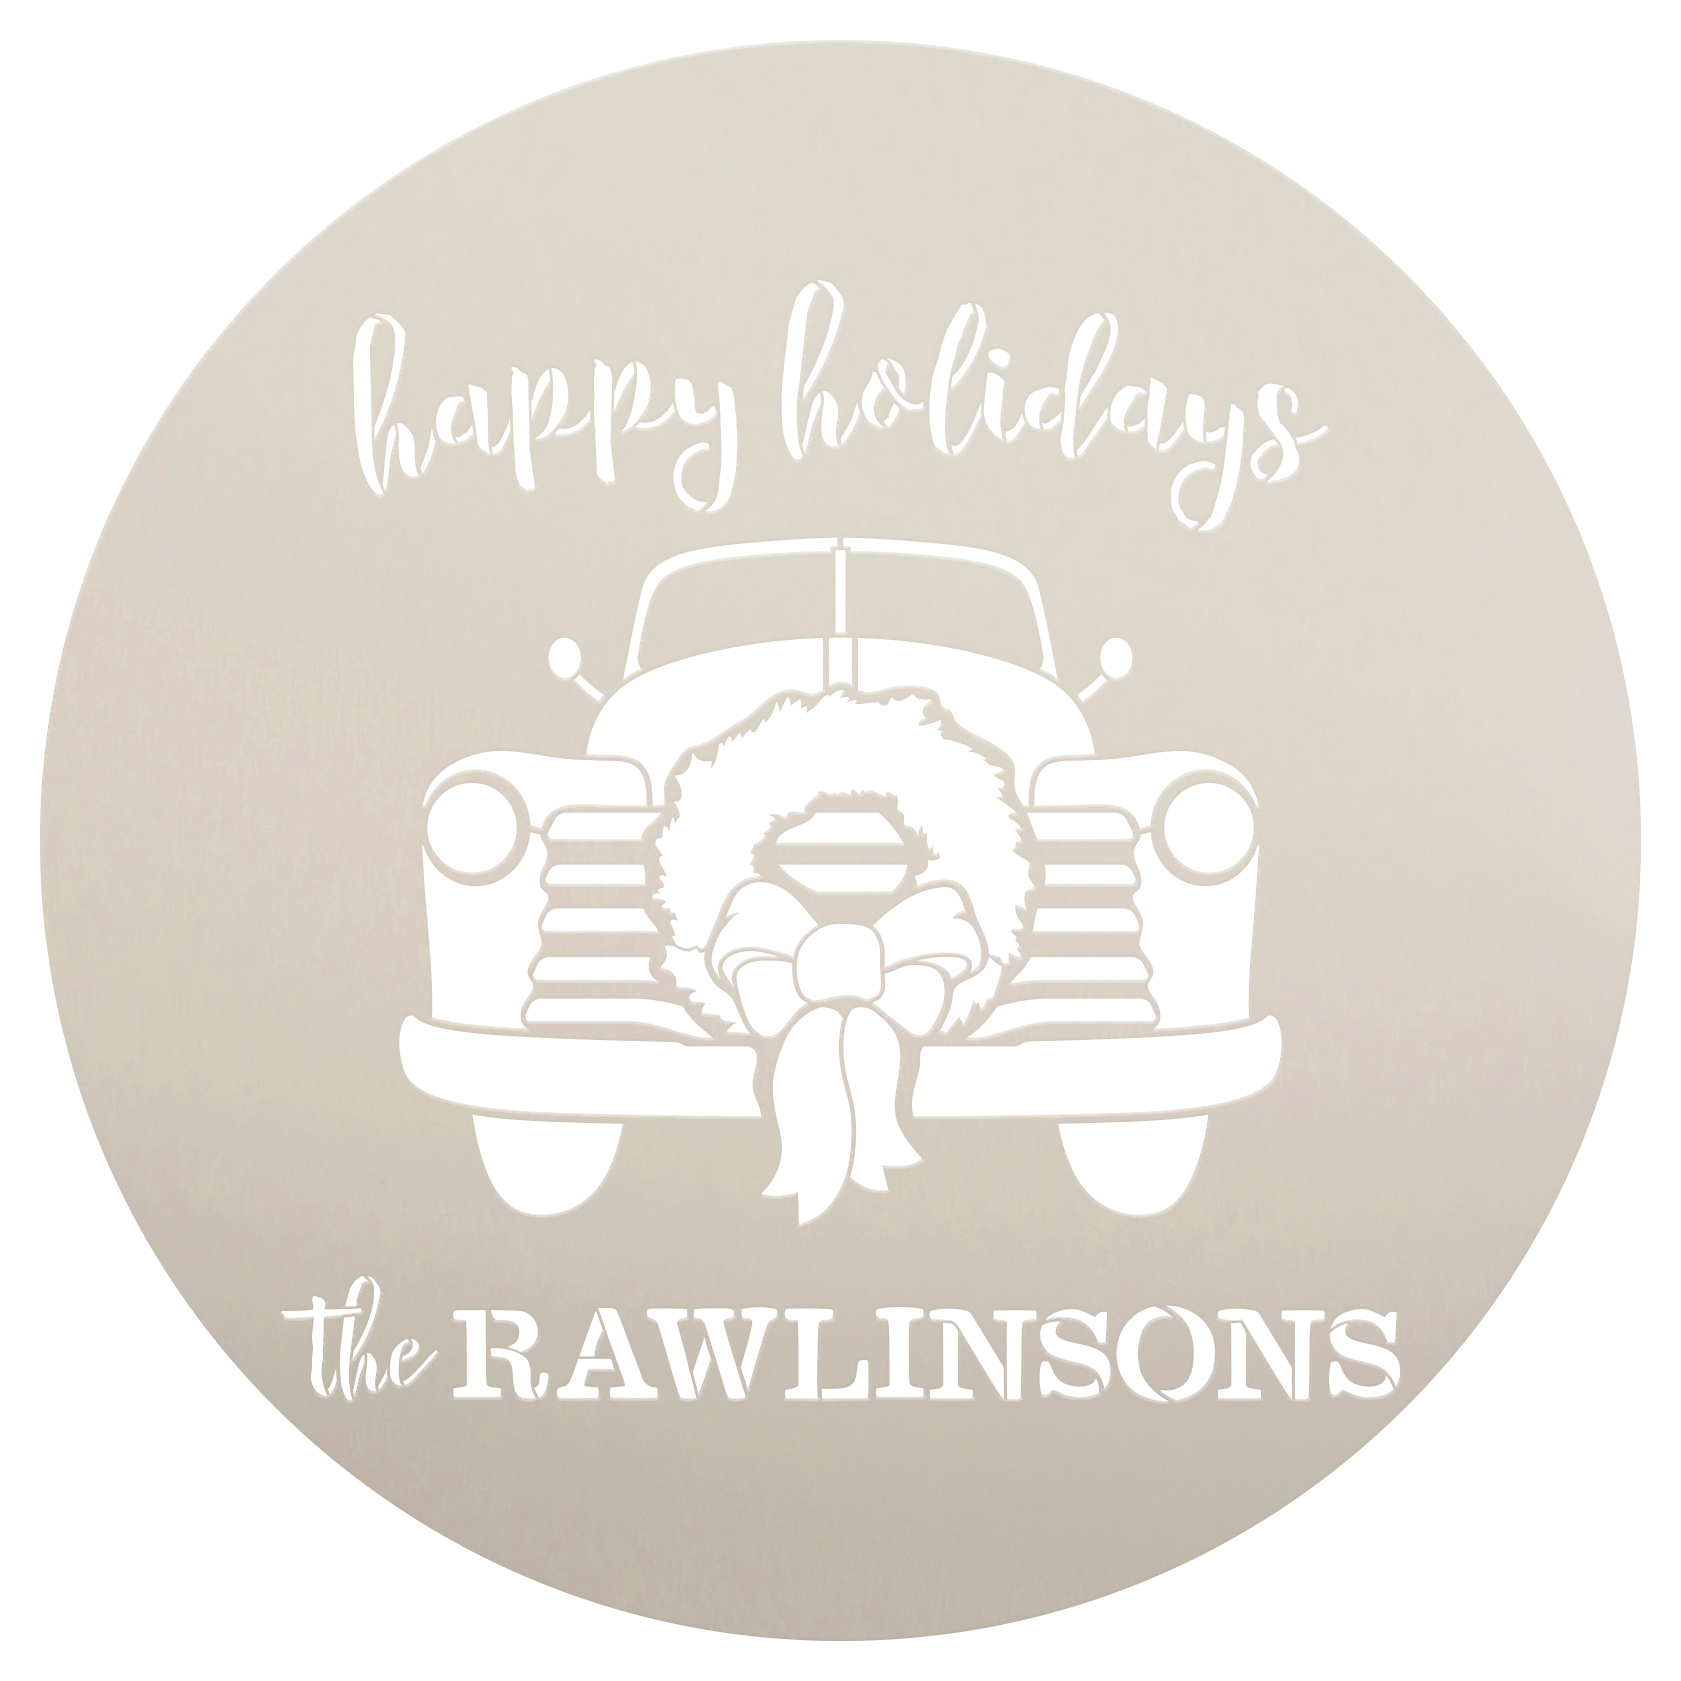 "Personalized Stencil by StudioR12 | Family Name | Happy Holidays | Truck Cursive Script Wreath Bow | Reusable Mylar Template | Craft | Rustic | Christmas | DIY  |Seasonal | Winter | 14"" Round | Medium"